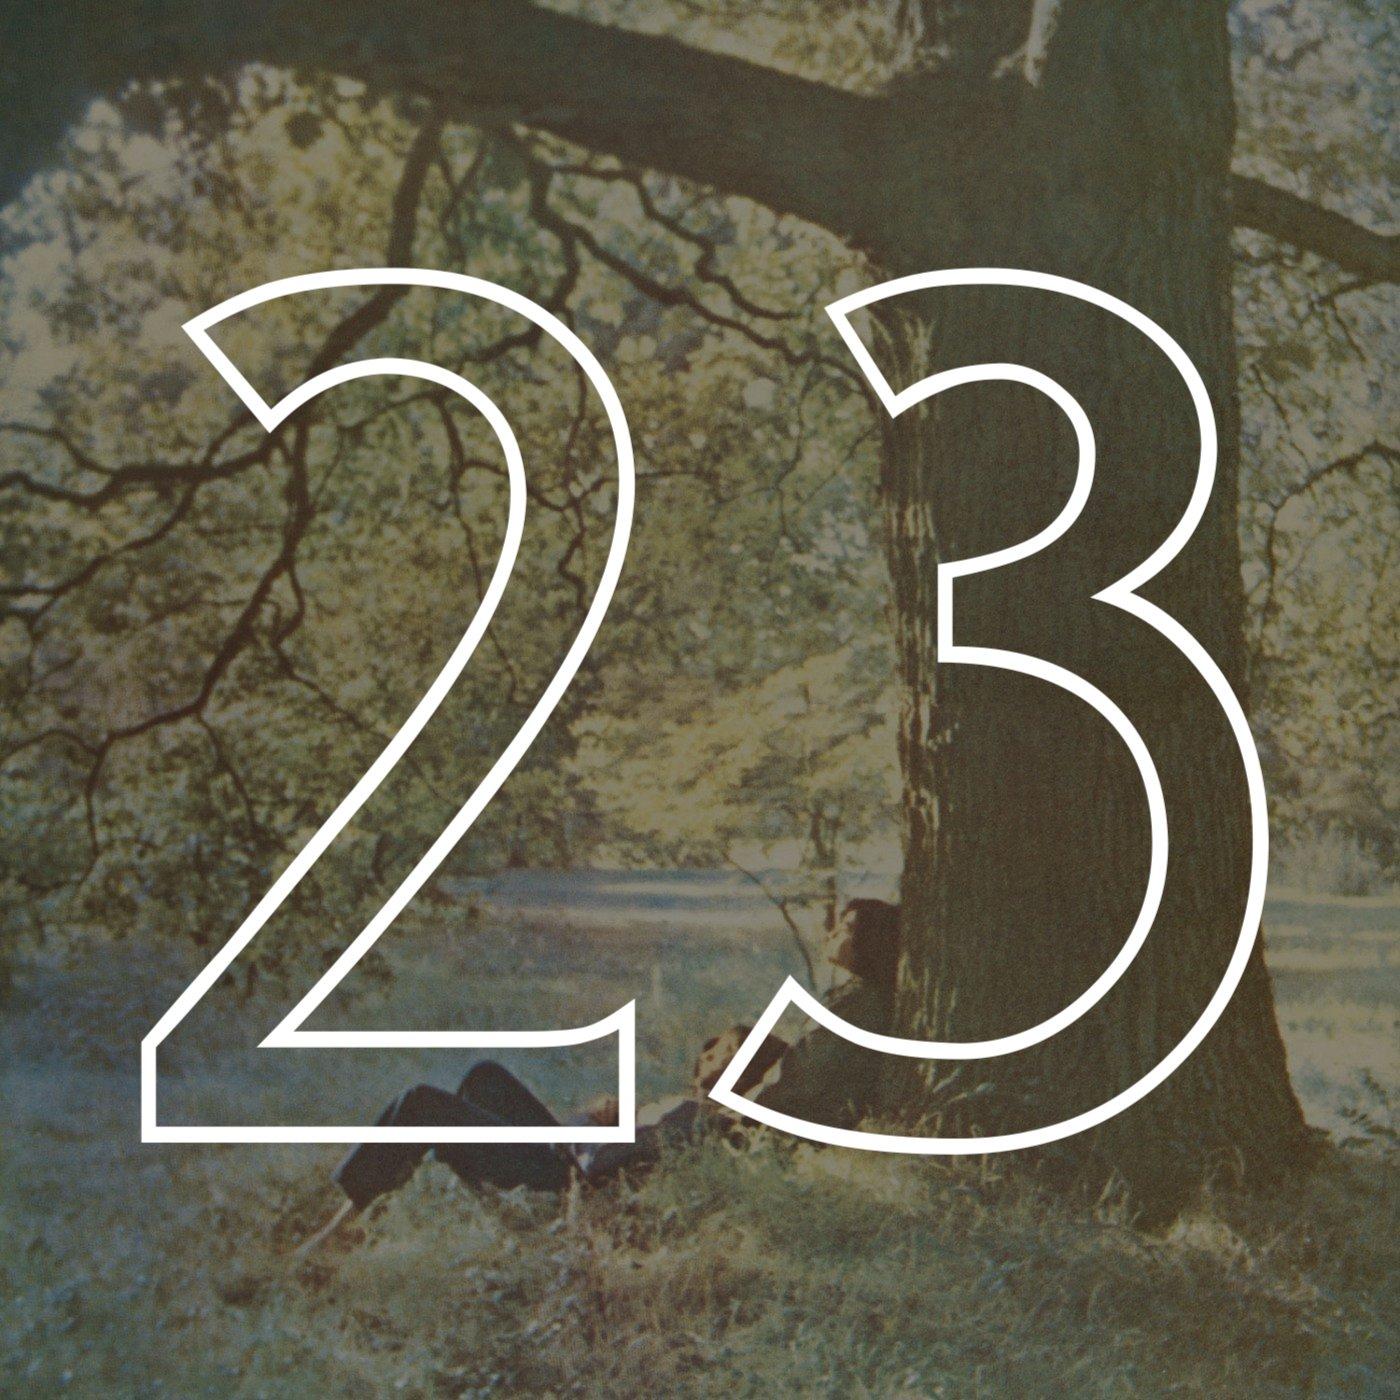 23 Plastic Ono Band.jpg